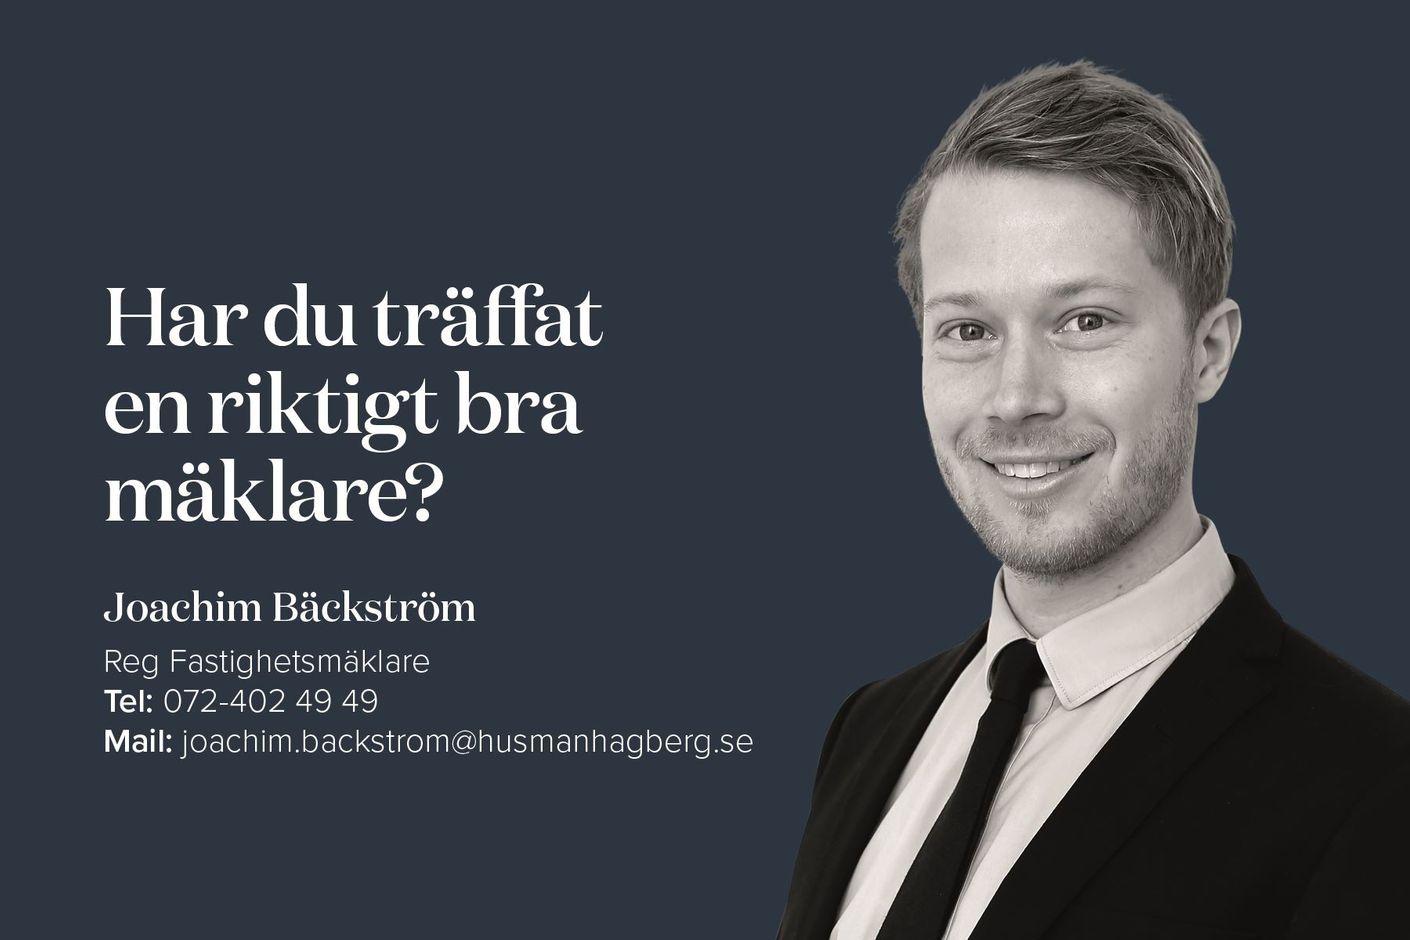 Par sker tv rums lgenhet i Karlstad, ref:22636 - Bostadssurf